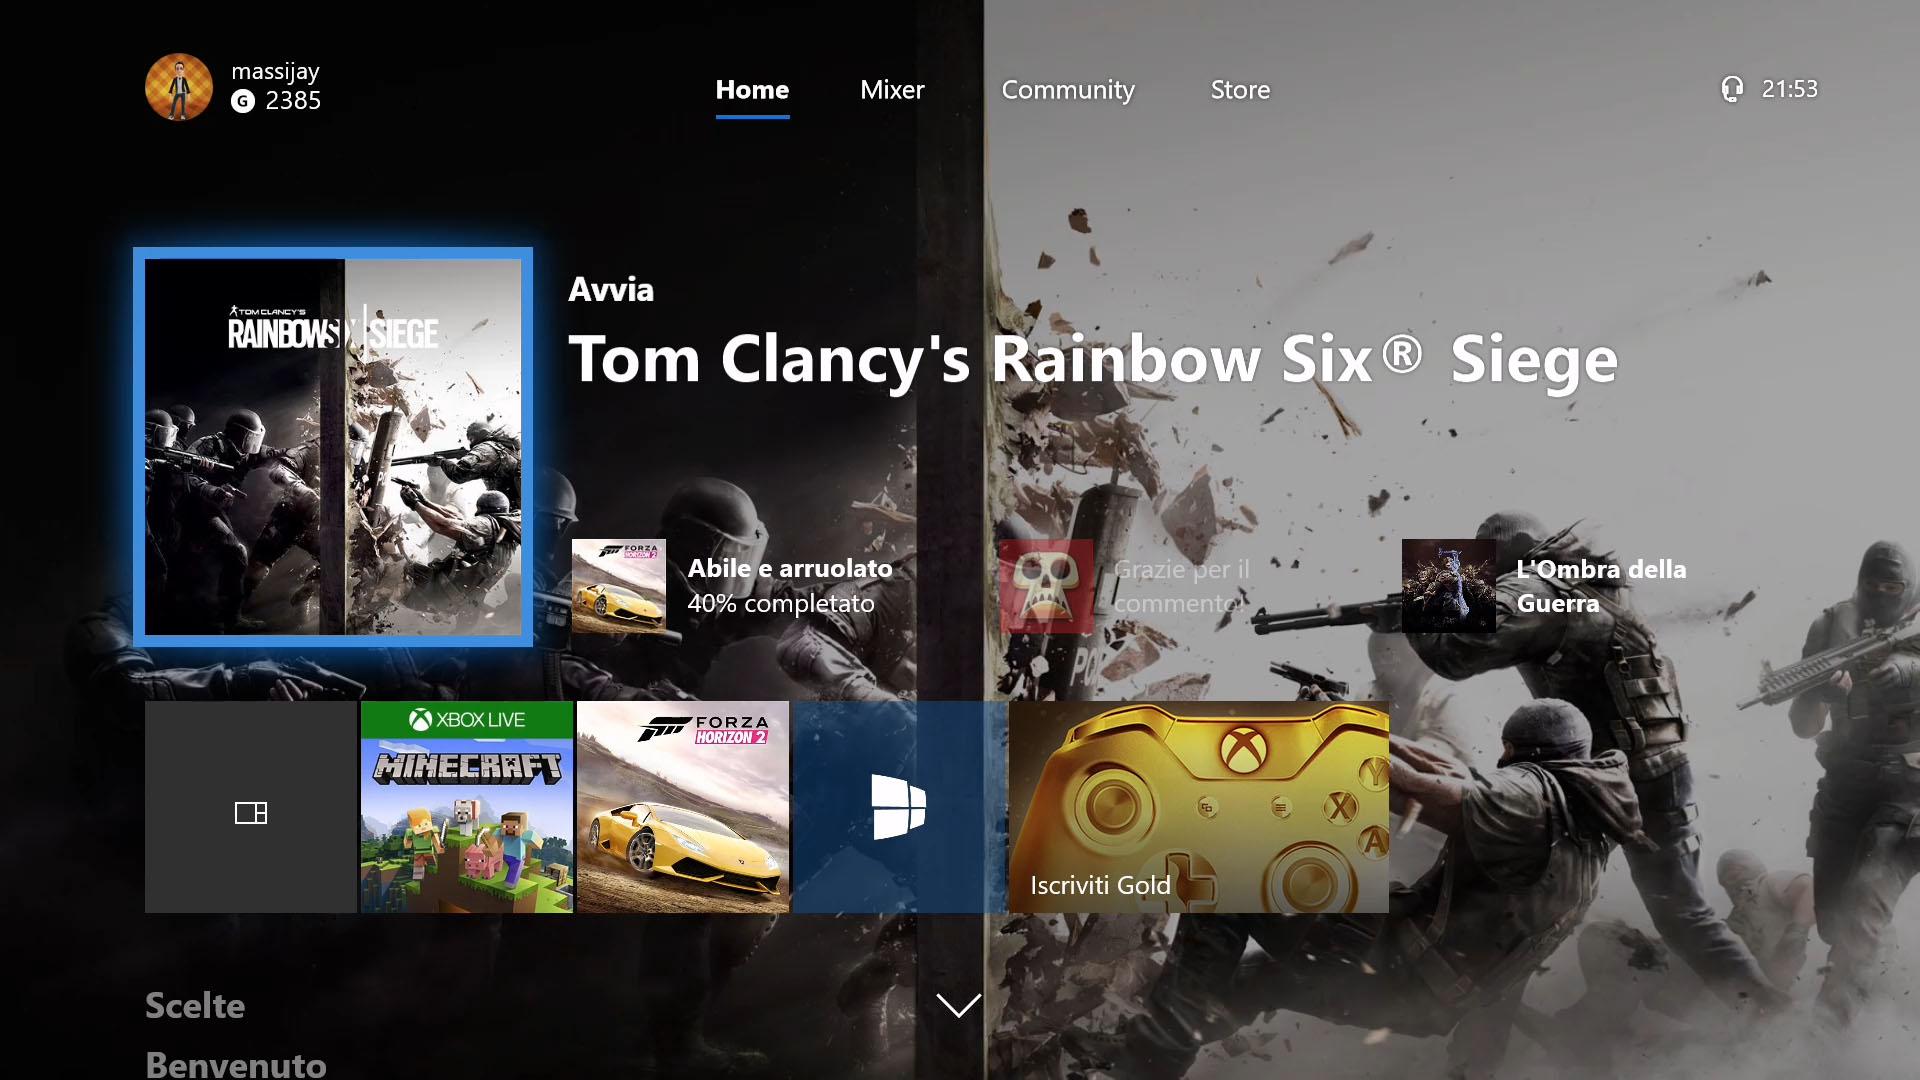 Windows 10 Fall Creators Update Xbox One dashboard Fluent Design